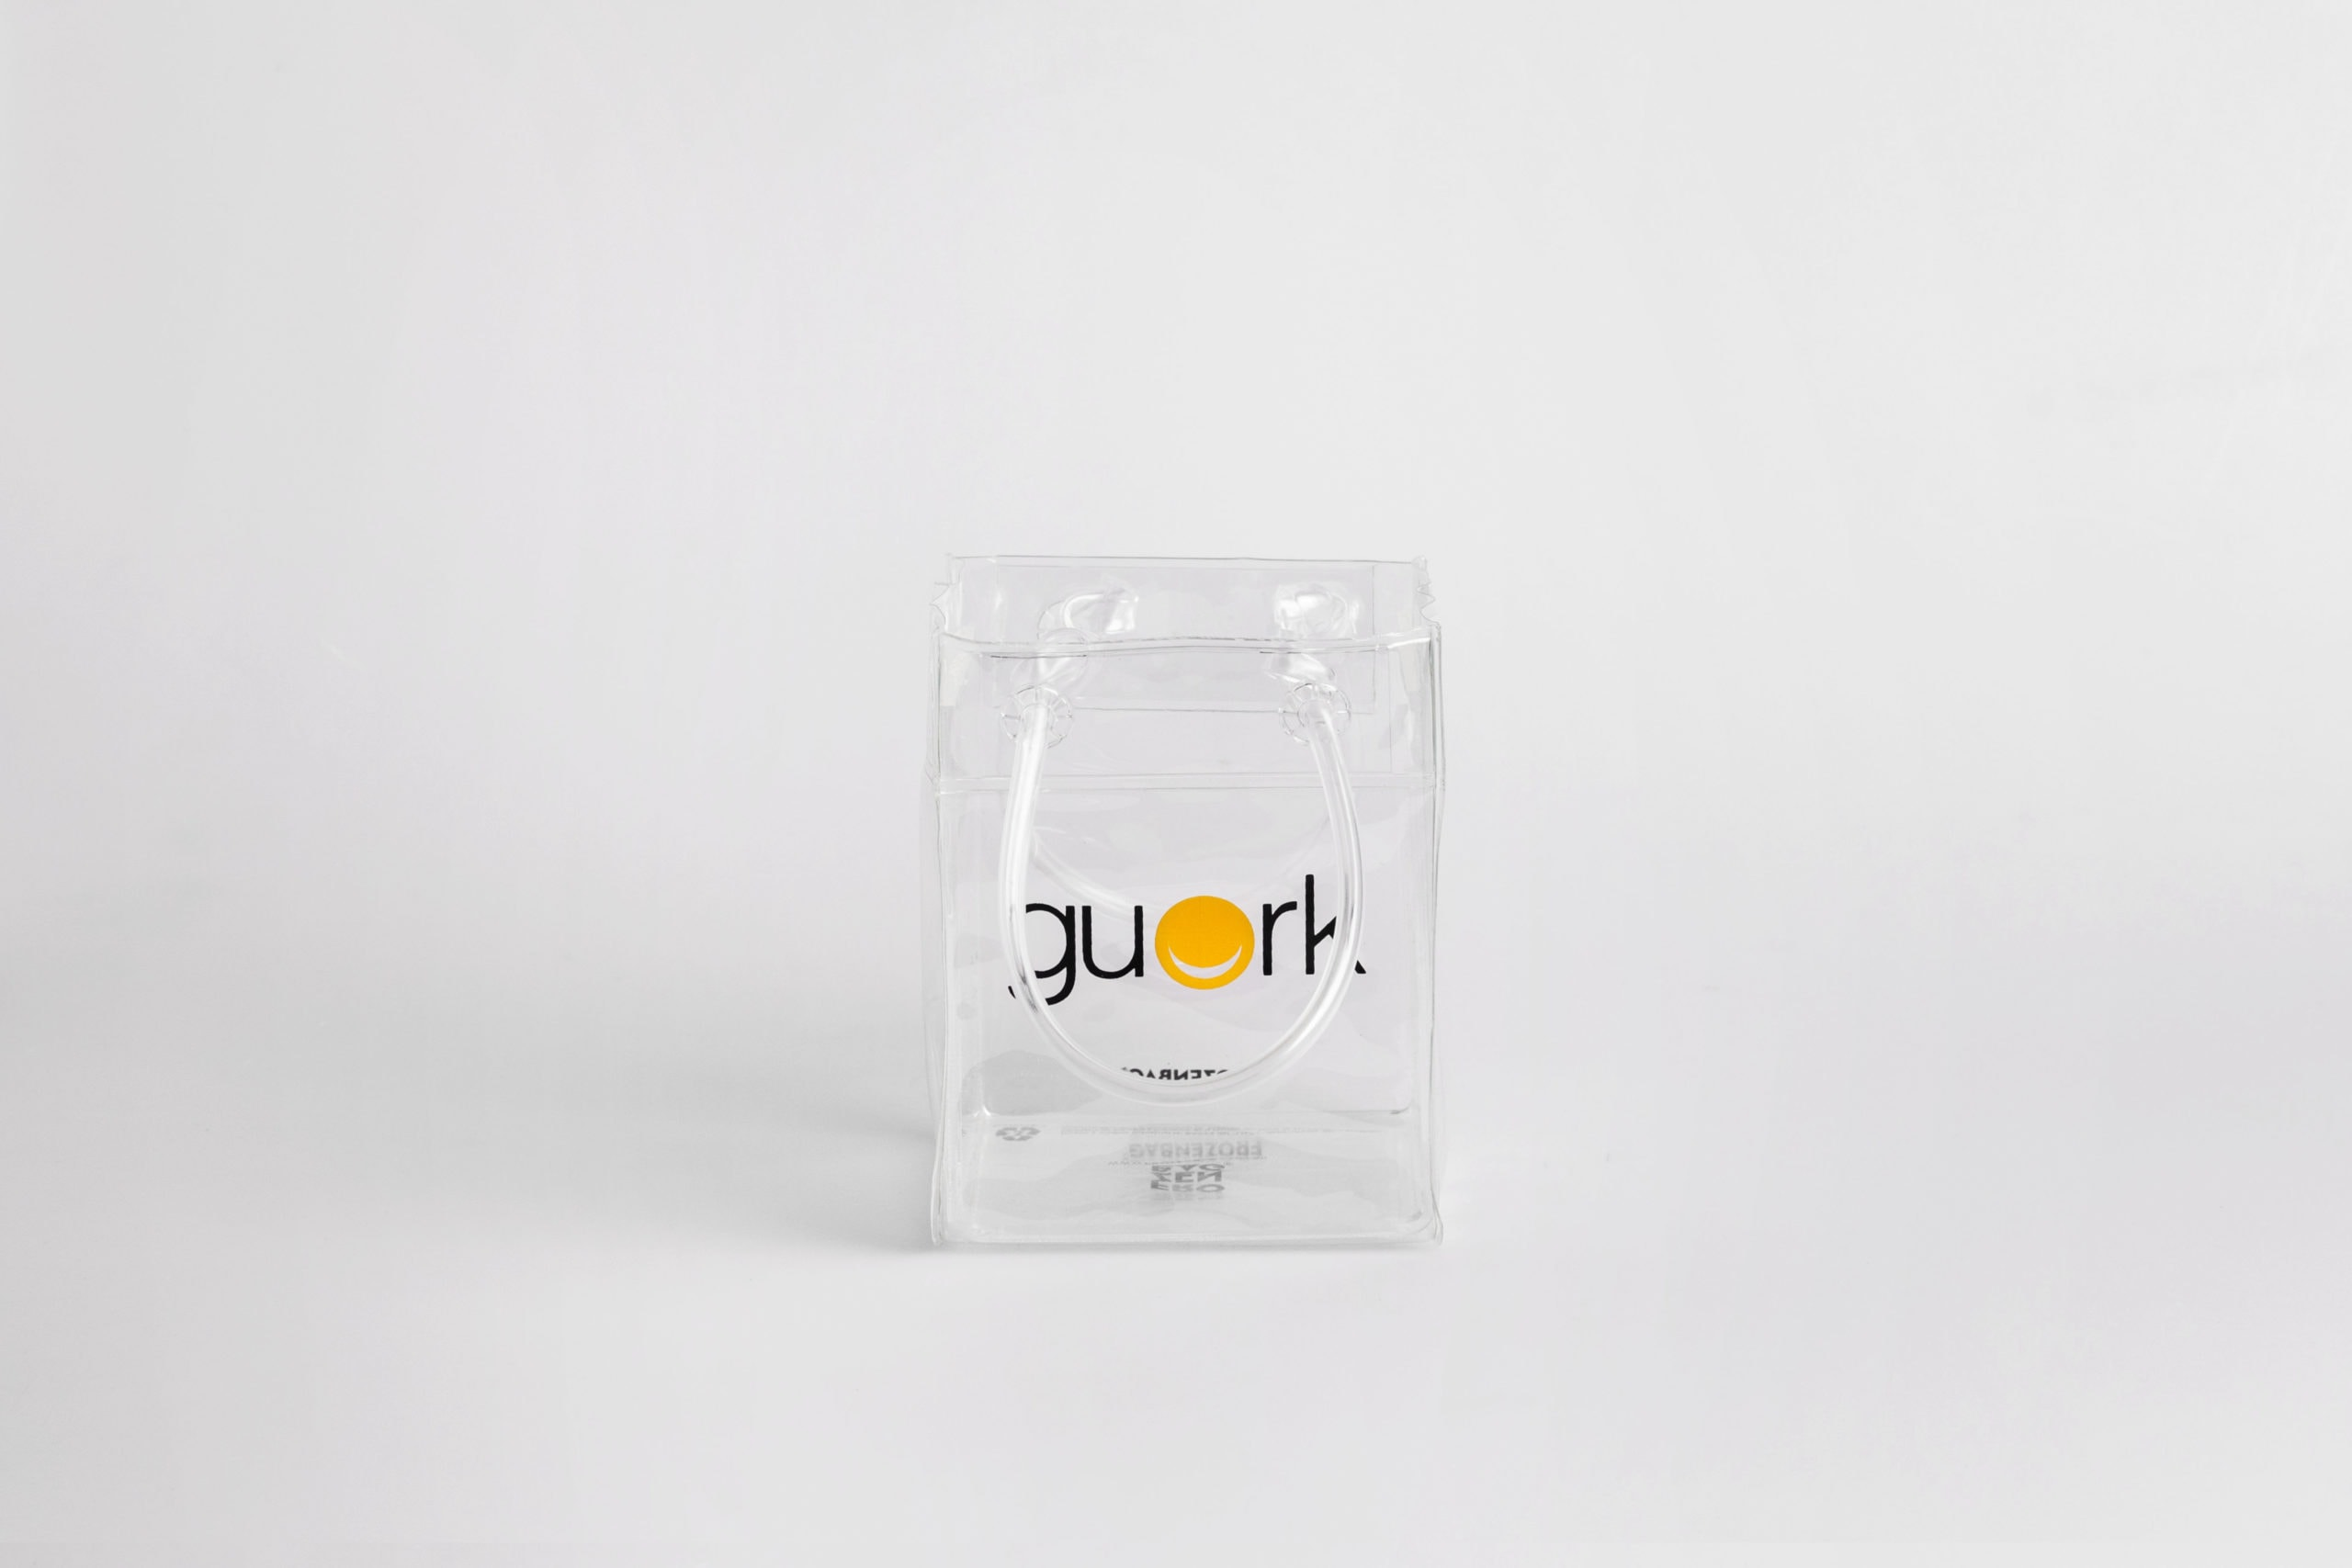 Guork ICE Crystal Frente